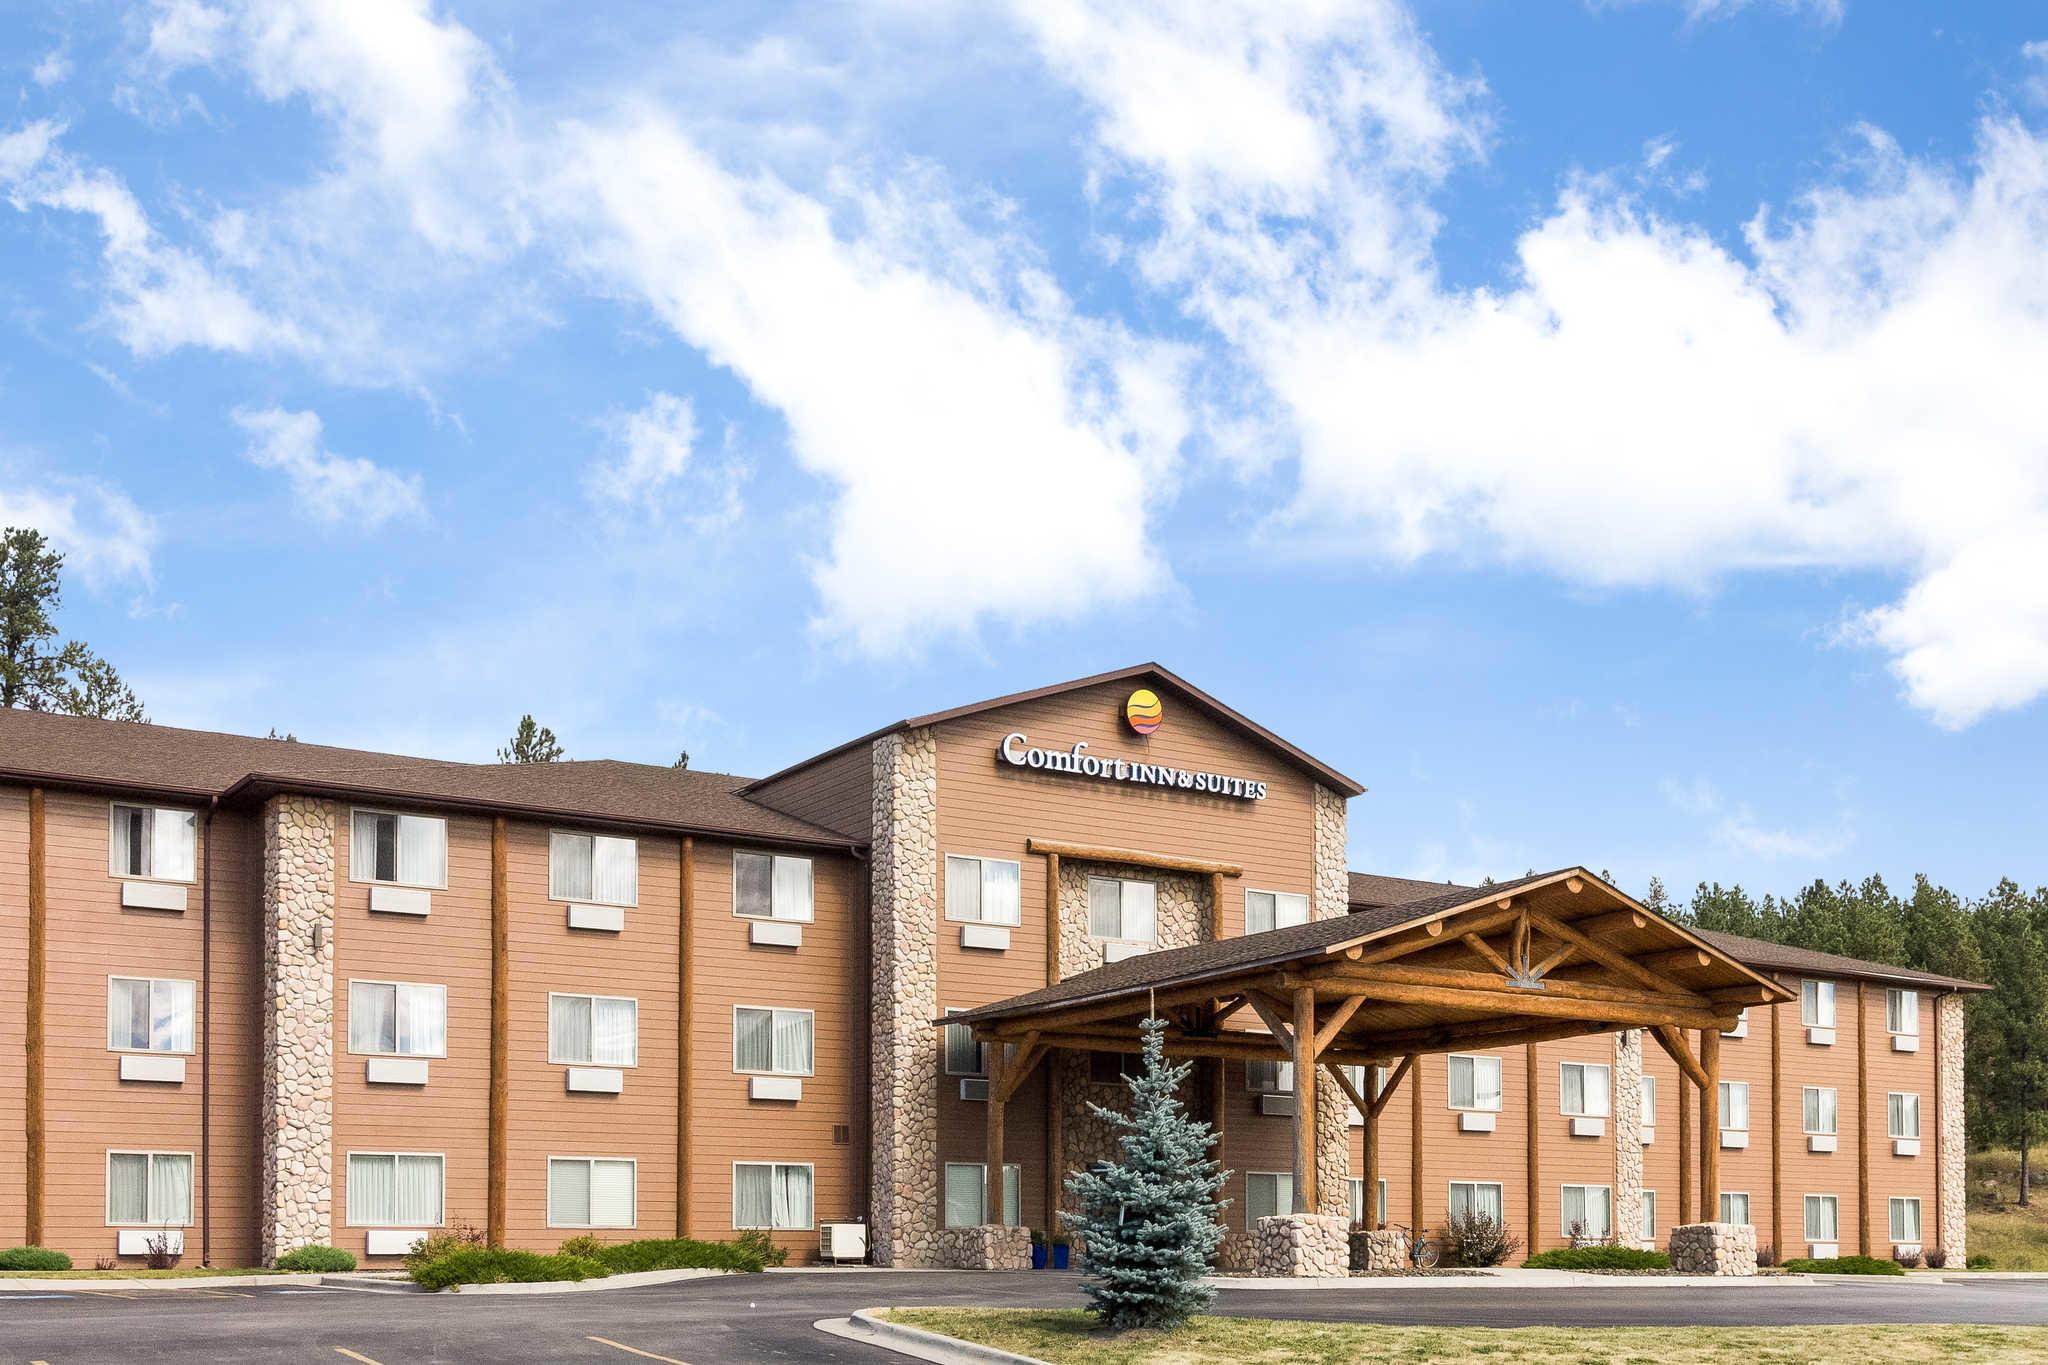 Comfort Inn & Suites - Custer, SD 57730 - (480)725-1632 | ShowMeLocal.com